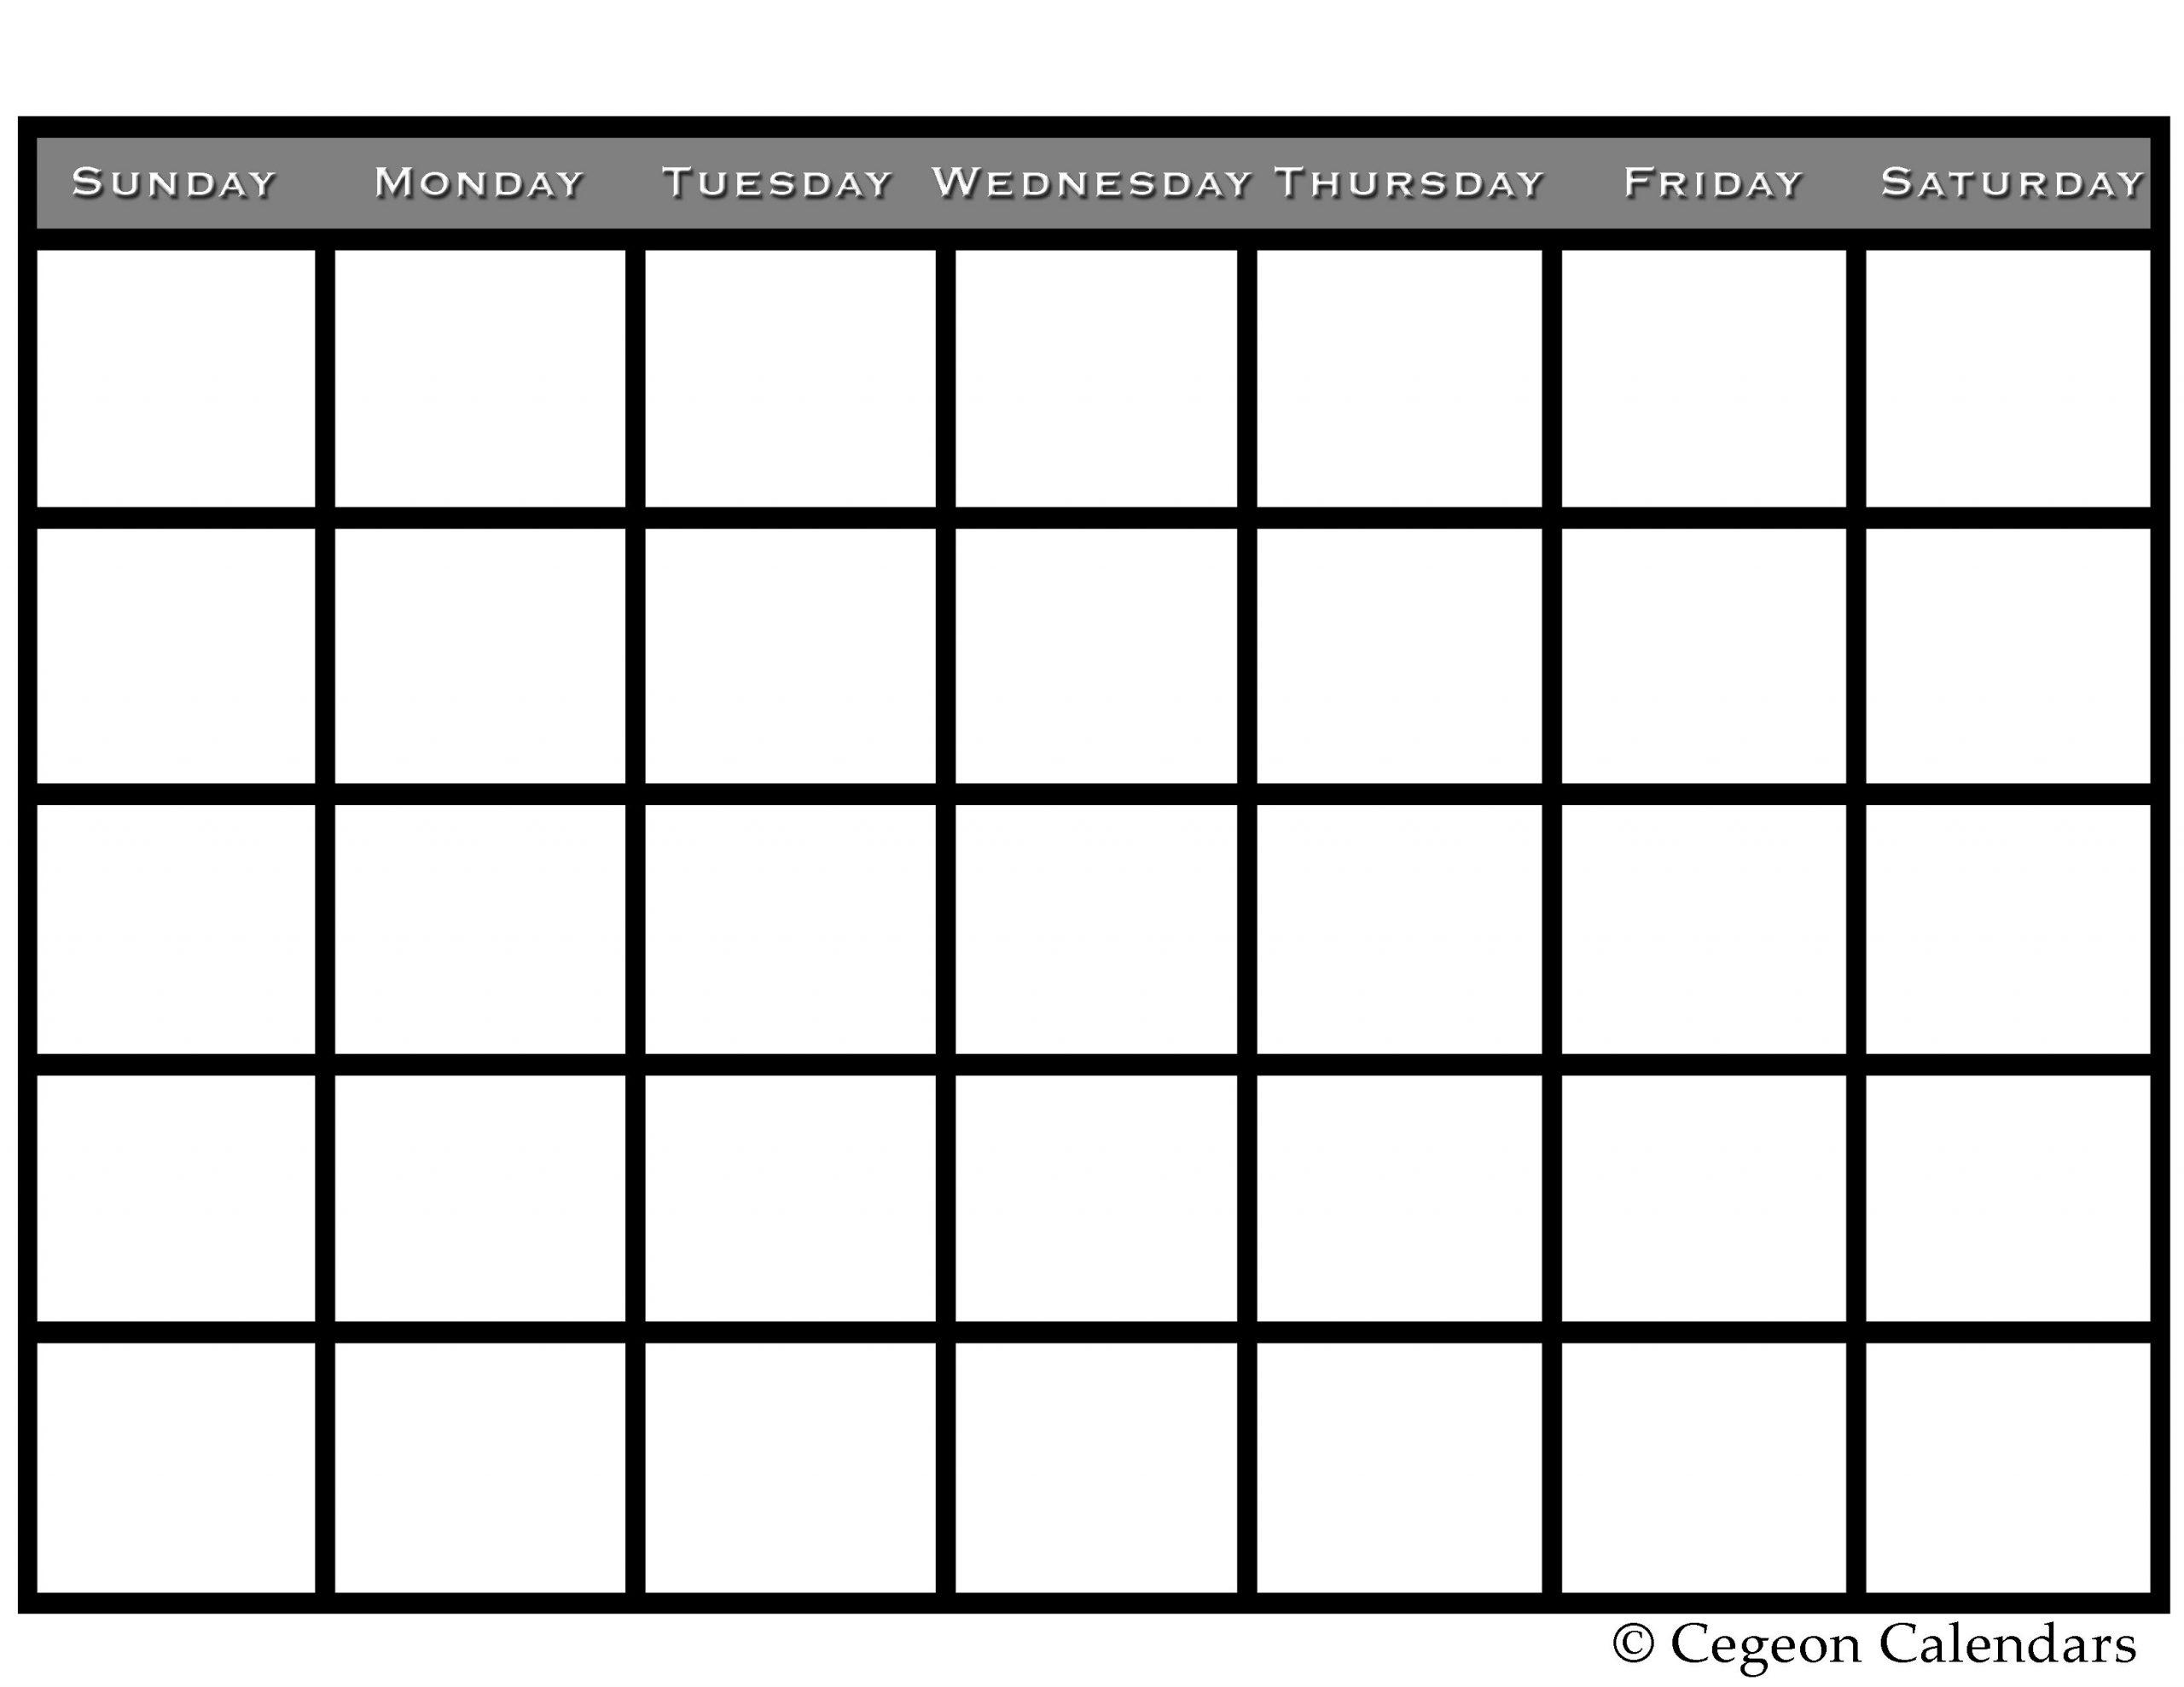 Get Your Free Printable Blank Calendar